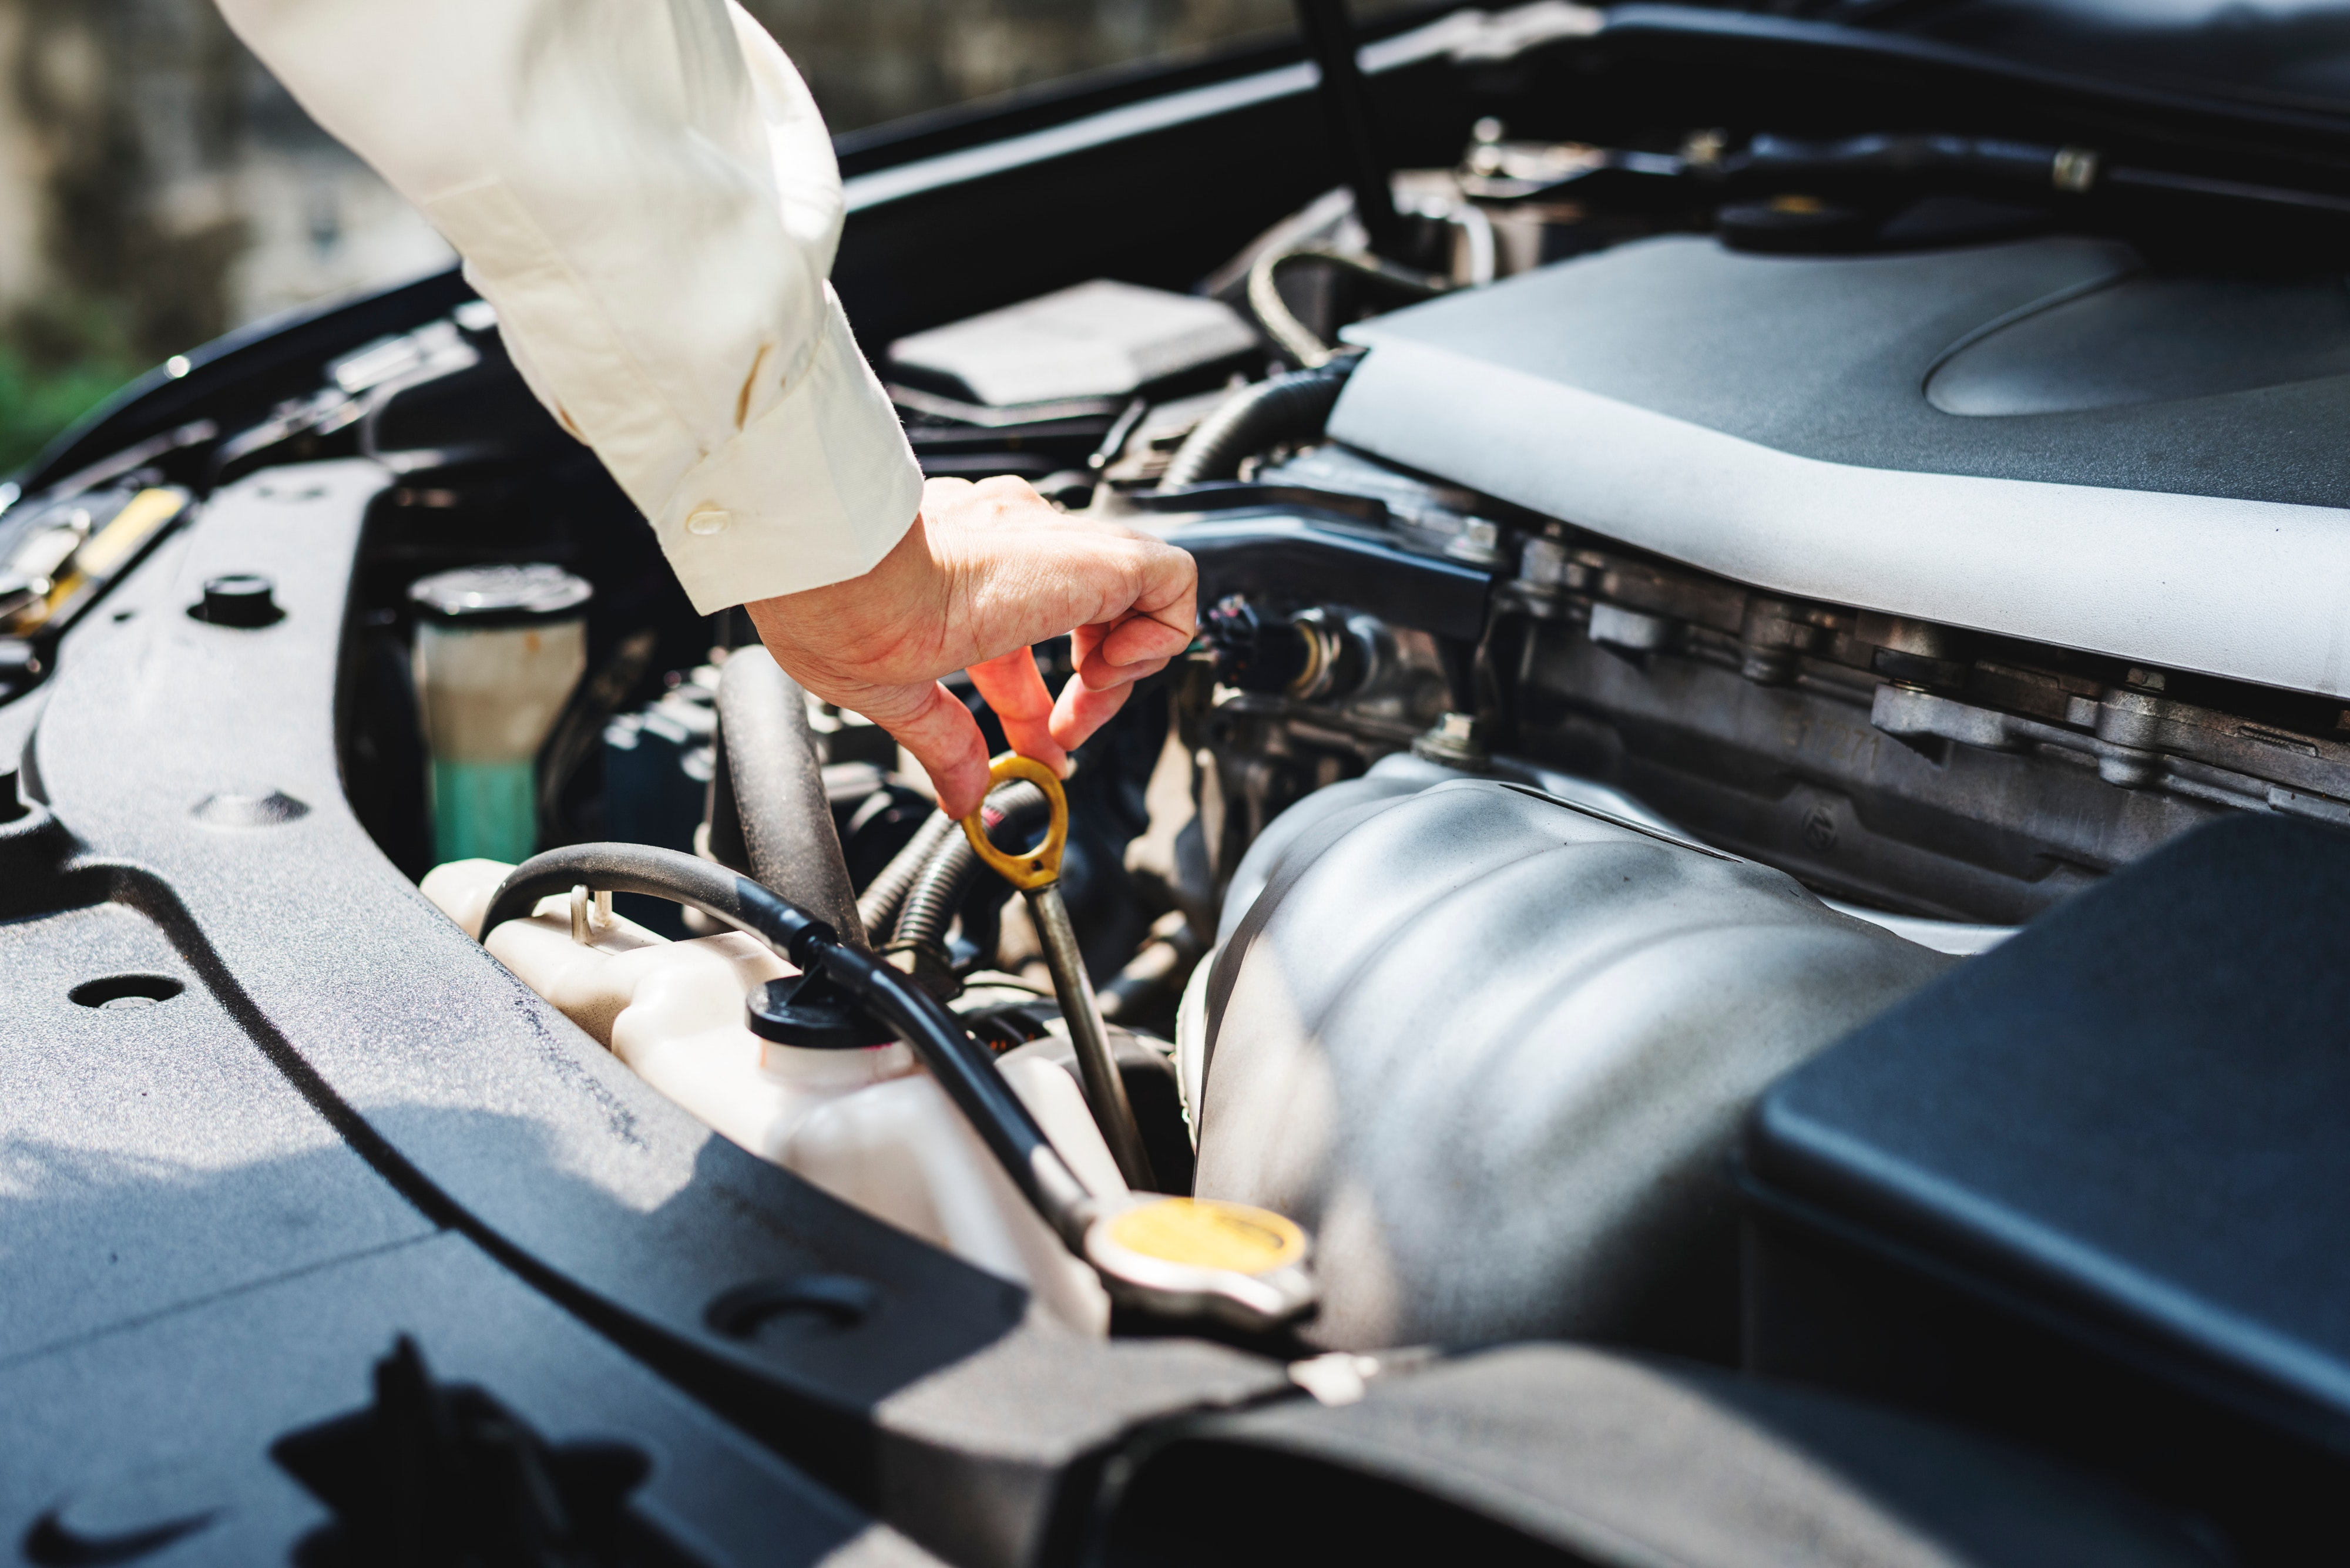 Kia Repair and Maintenance in Houston, TX